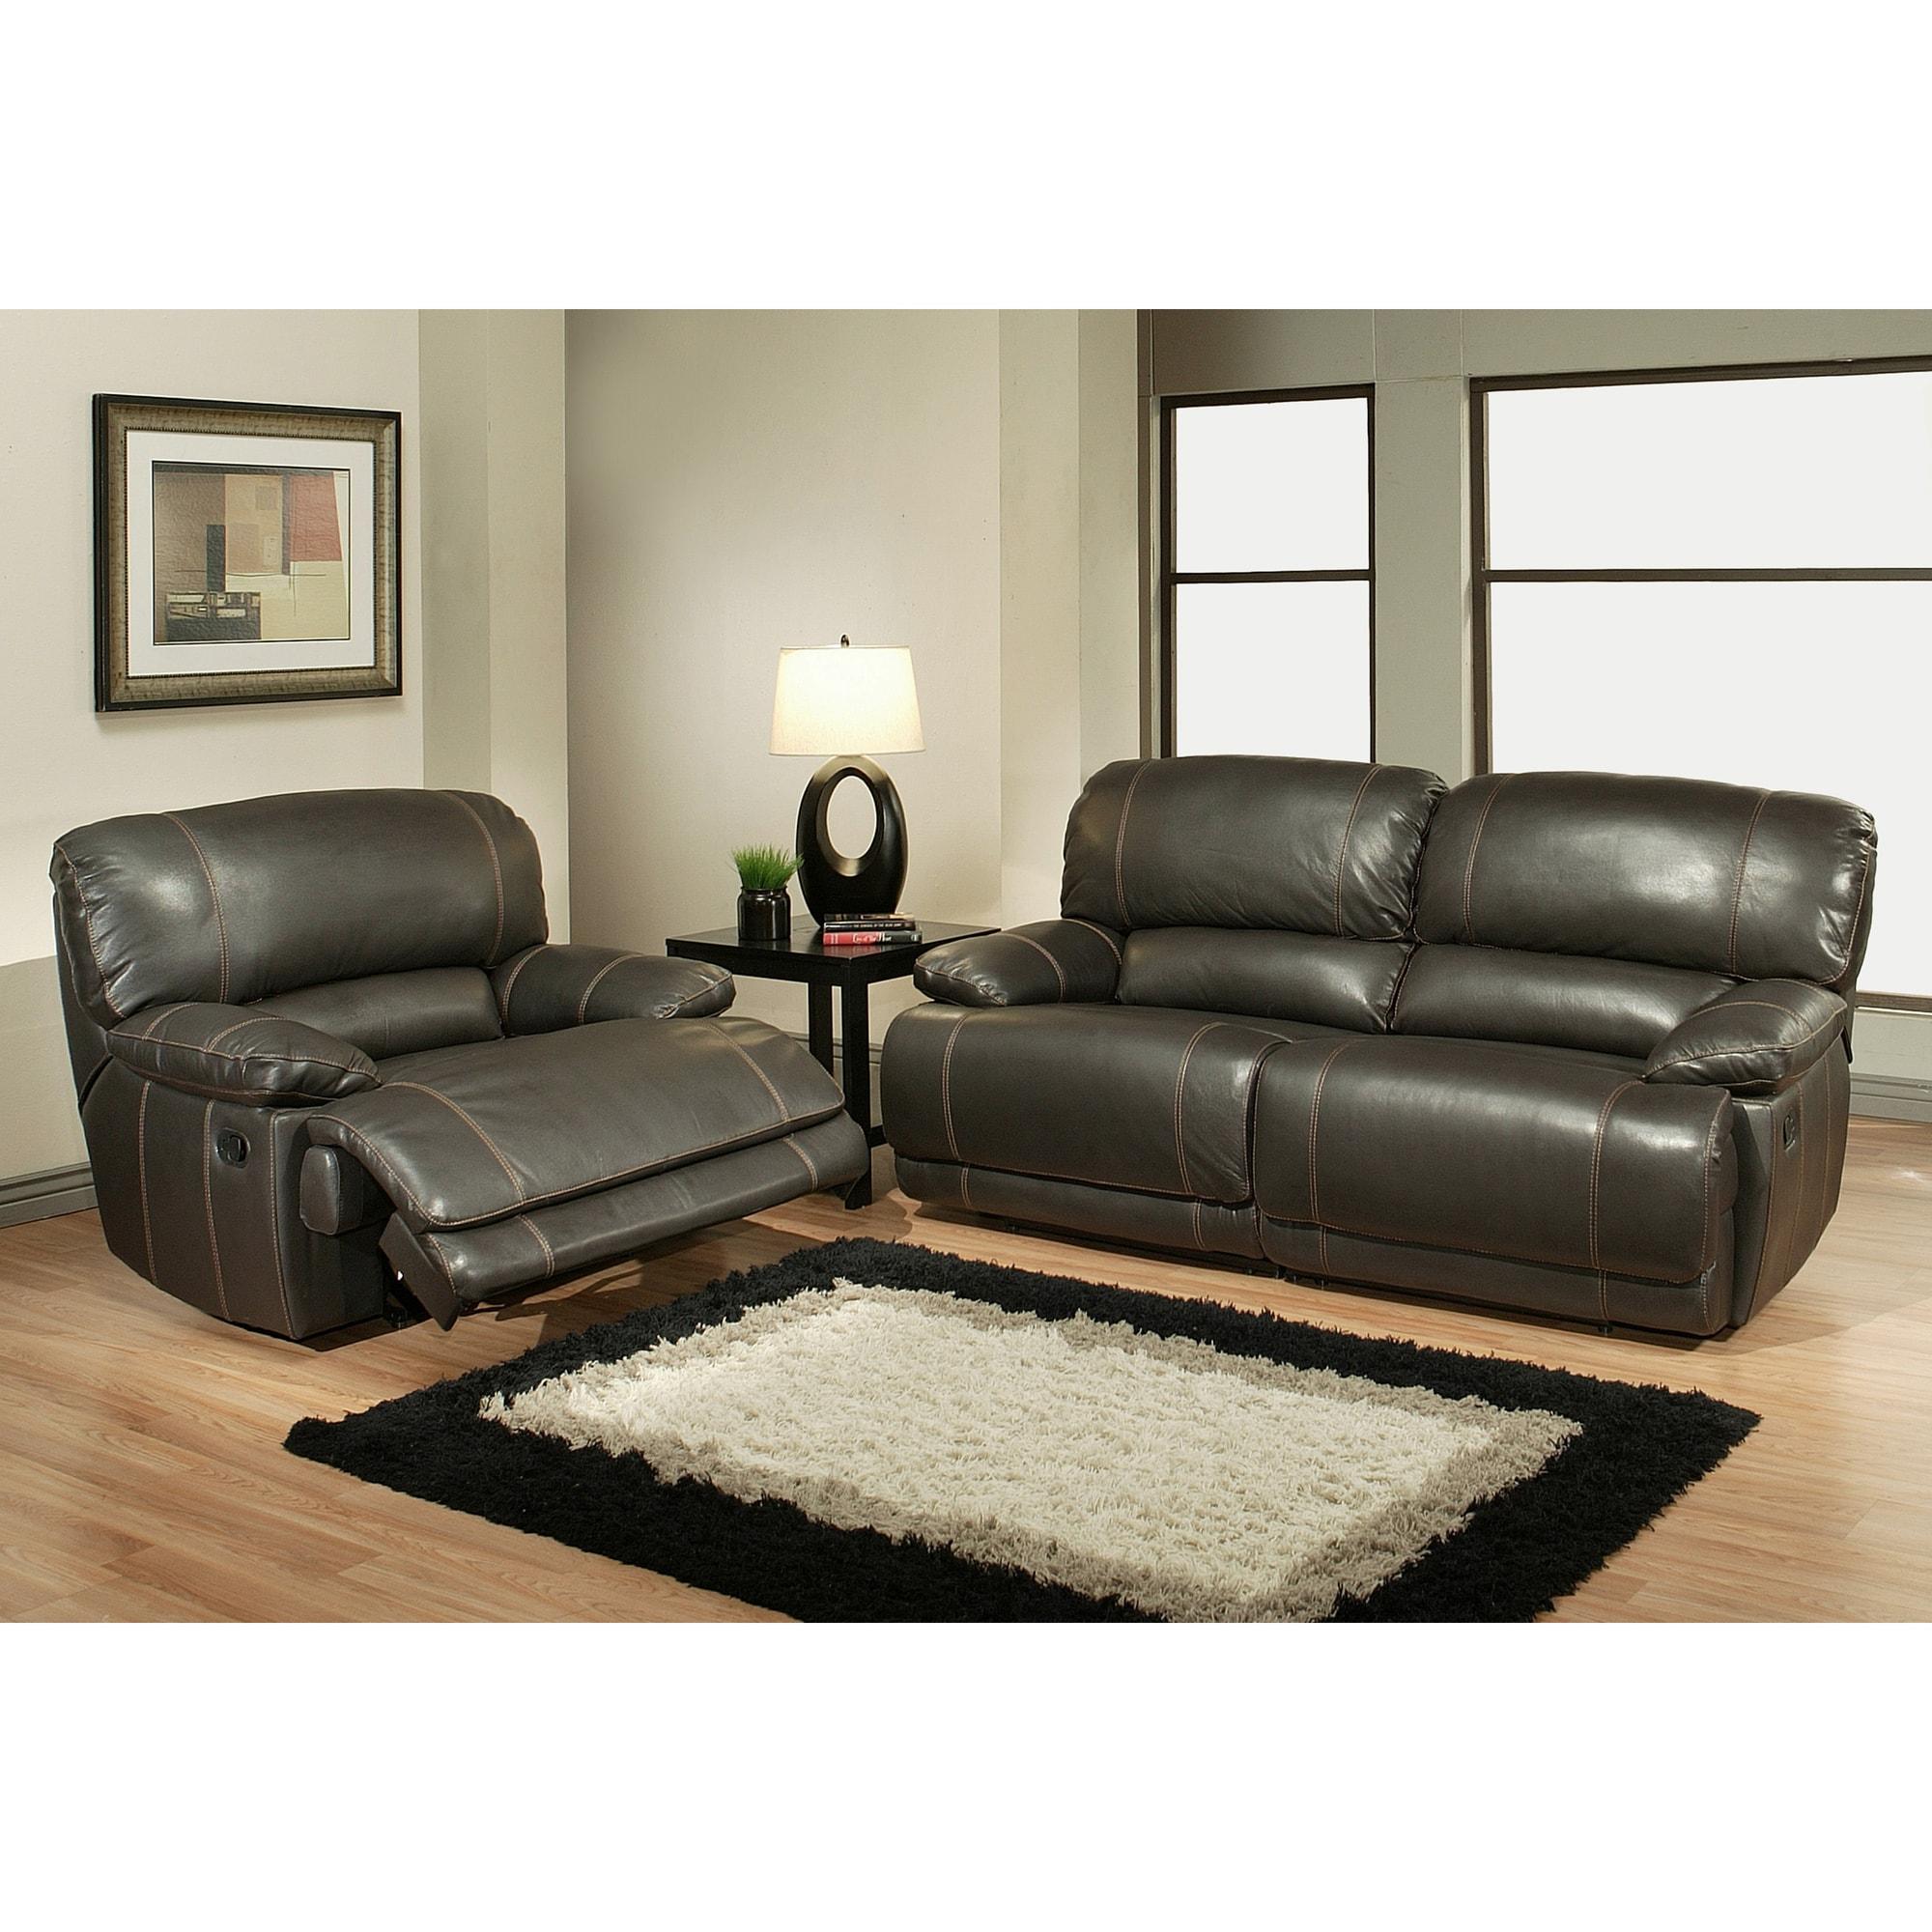 Cool Abbyson Living Aspen Premium Top Grain Reclining Leather Sofa 2 Armchairs Bralicious Painted Fabric Chair Ideas Braliciousco